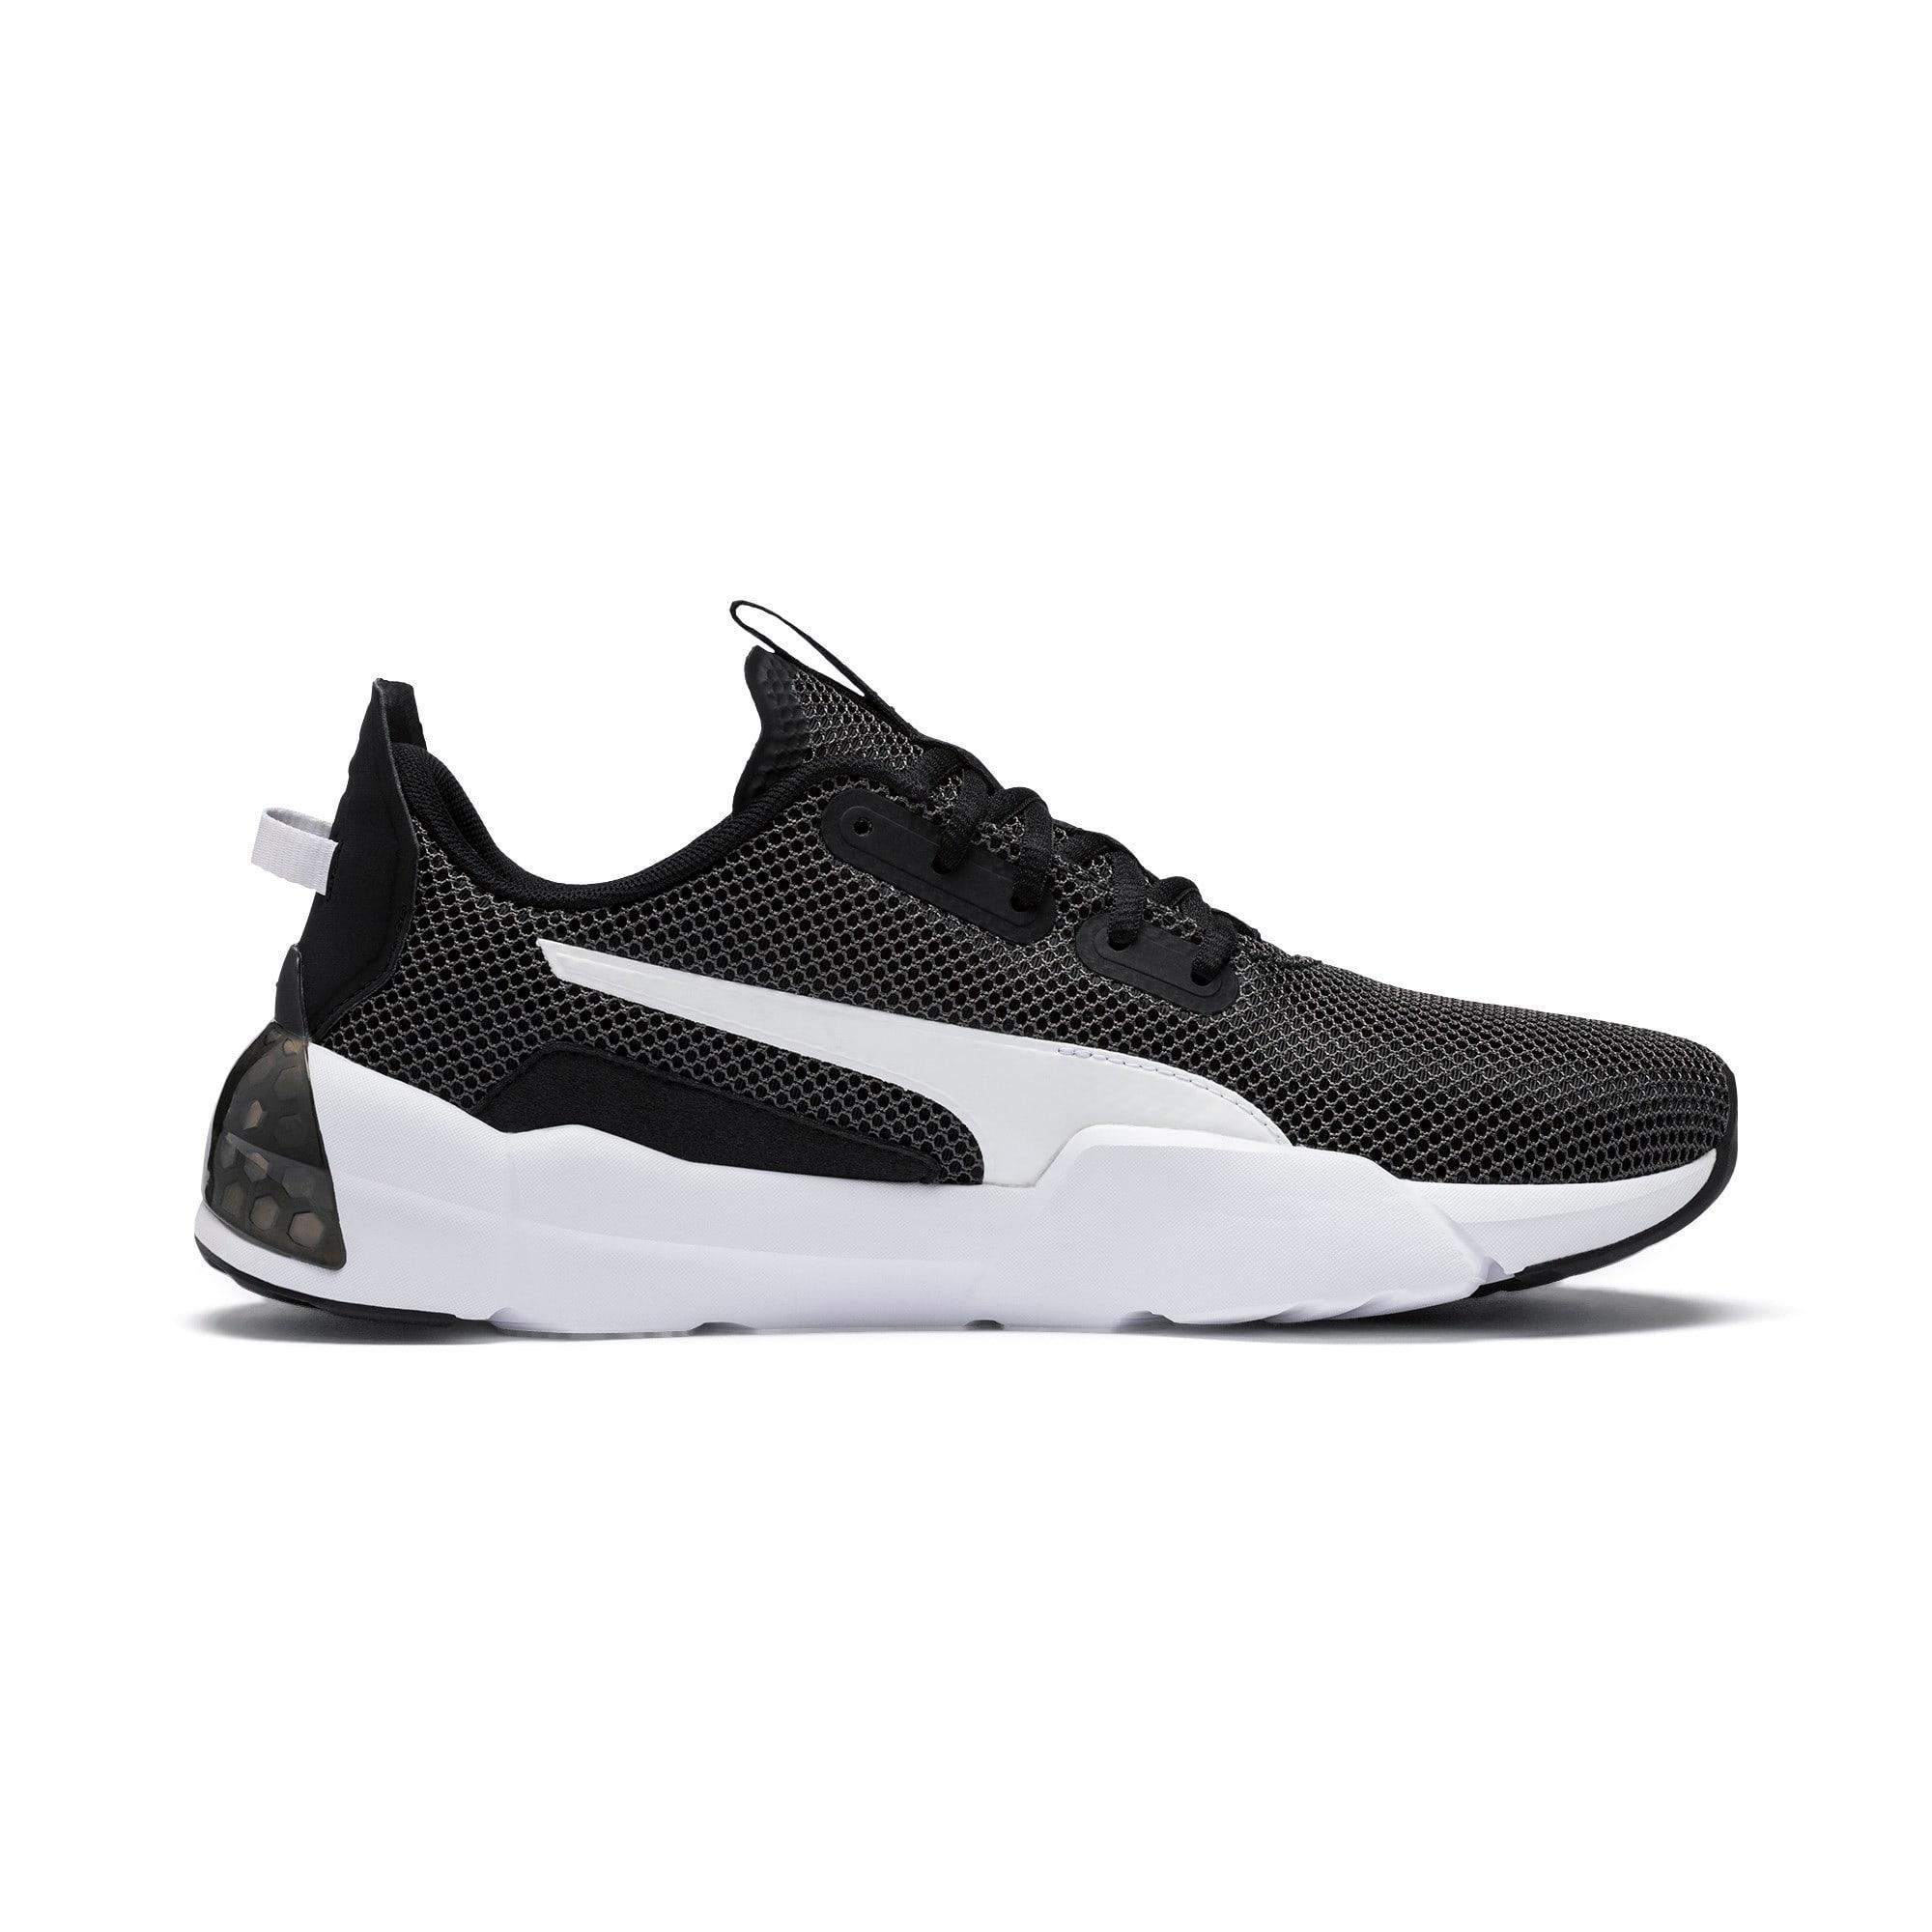 Thumbnail 6 of CELL Phase Men's Training Shoes, Puma Black-Puma White, medium